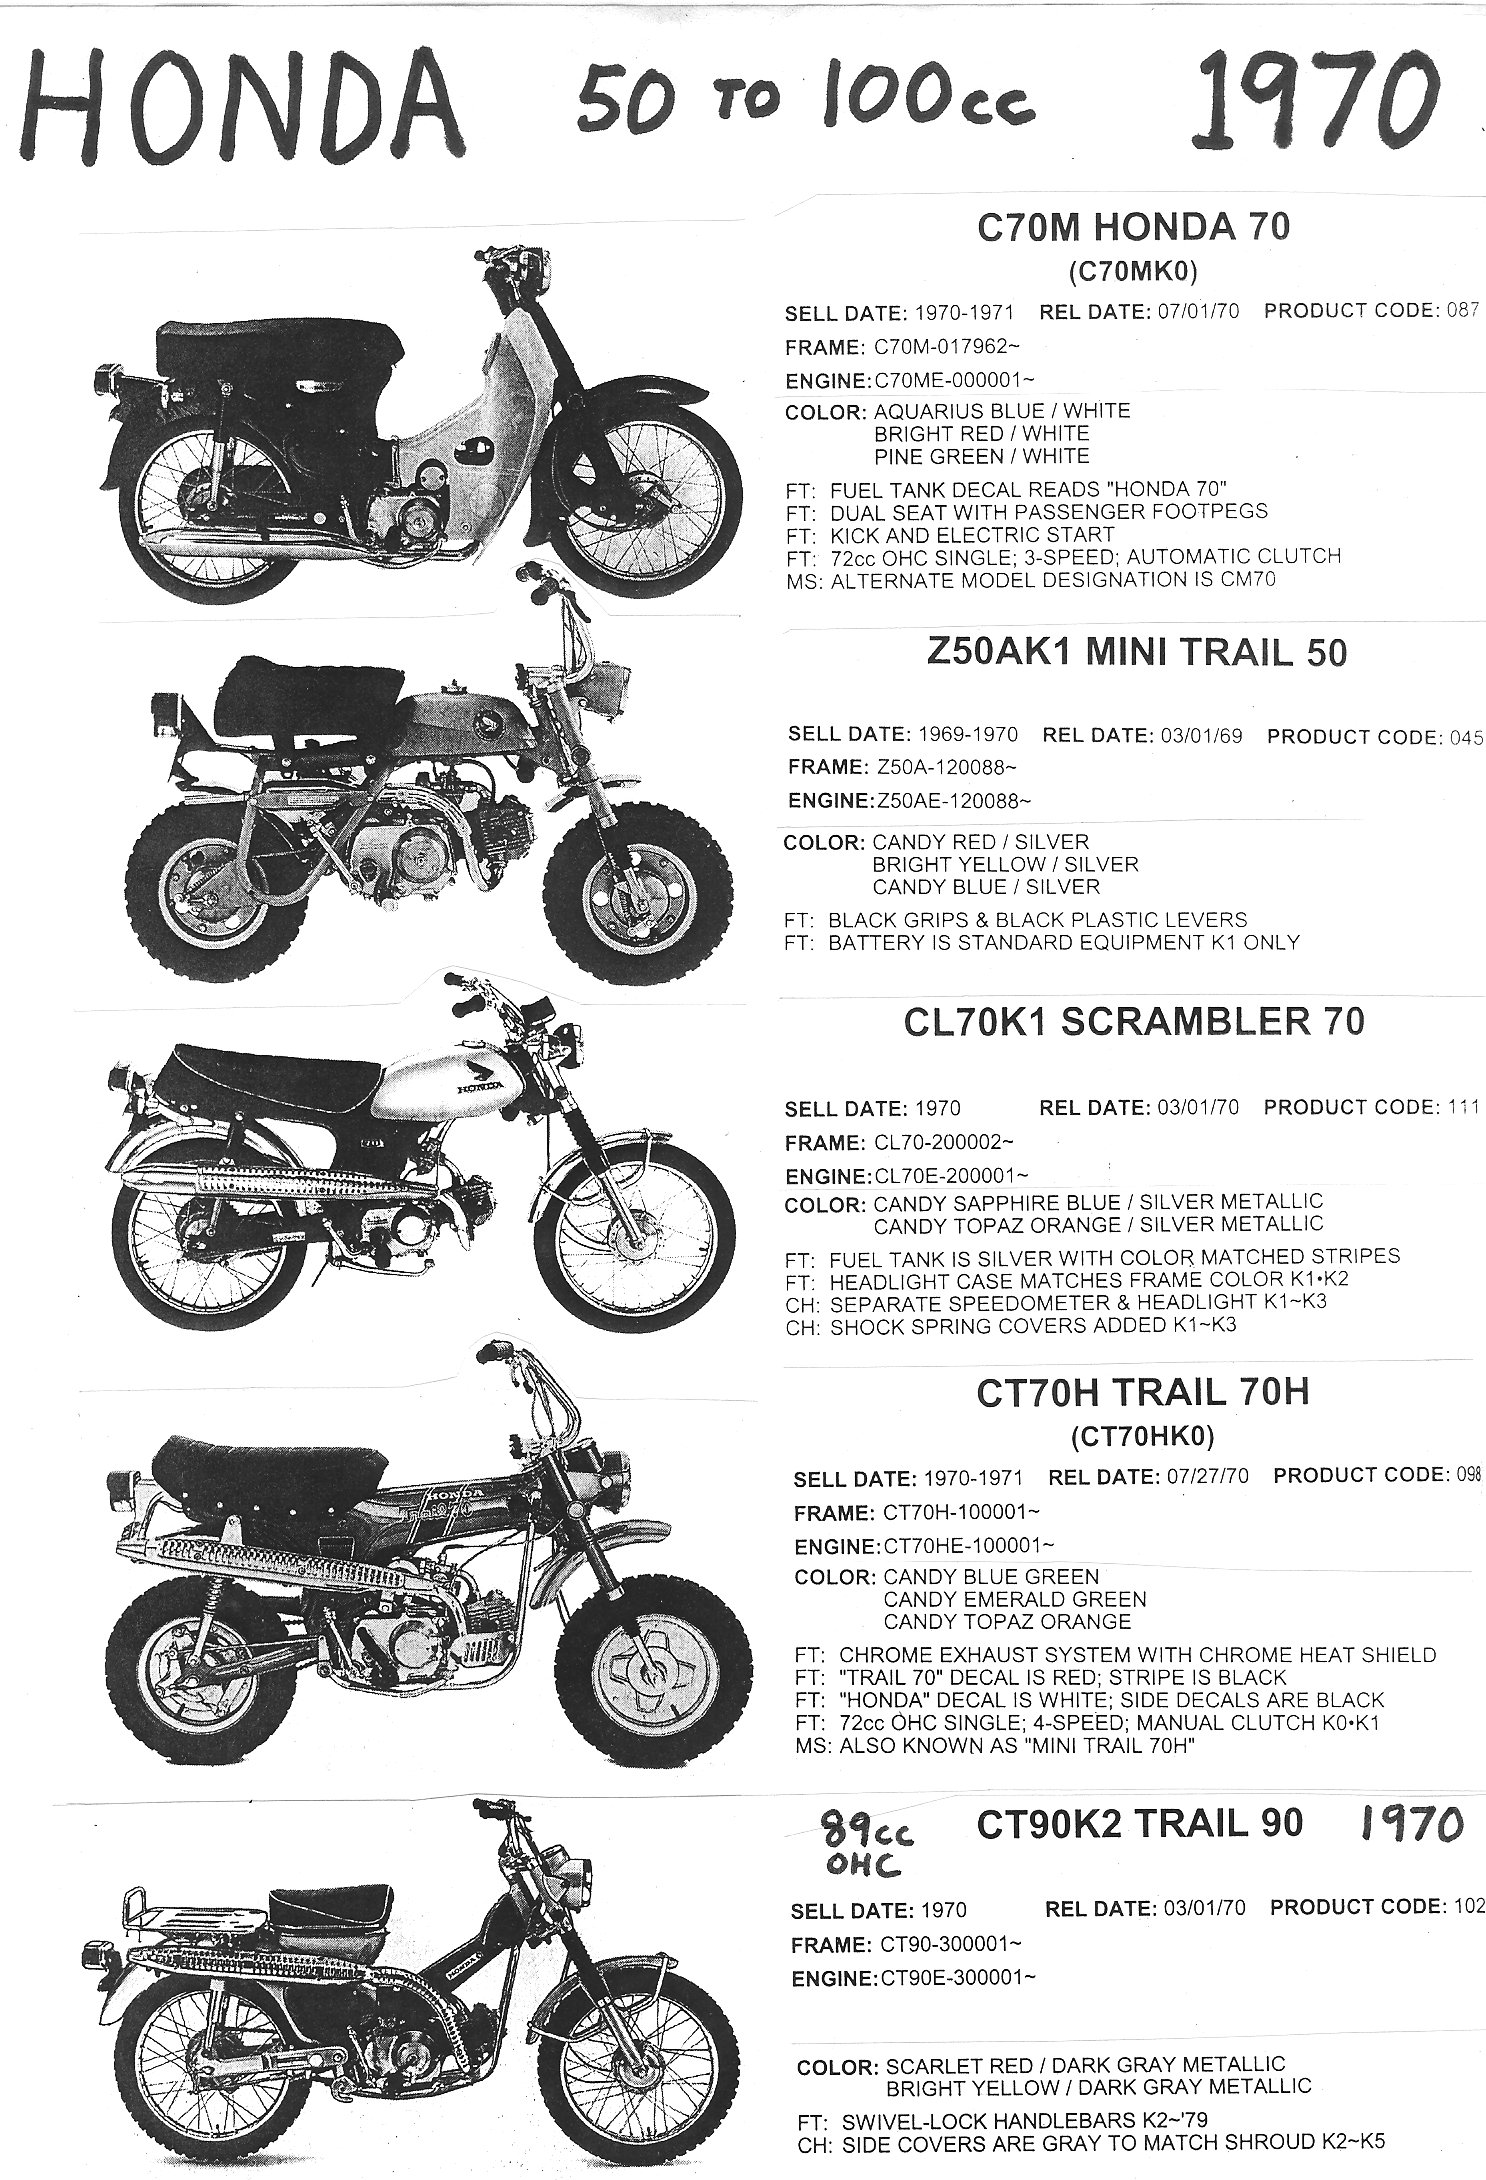 HONDA PC50 K1 FRONT WHEEL BEARINGS YEARS 1979-1982